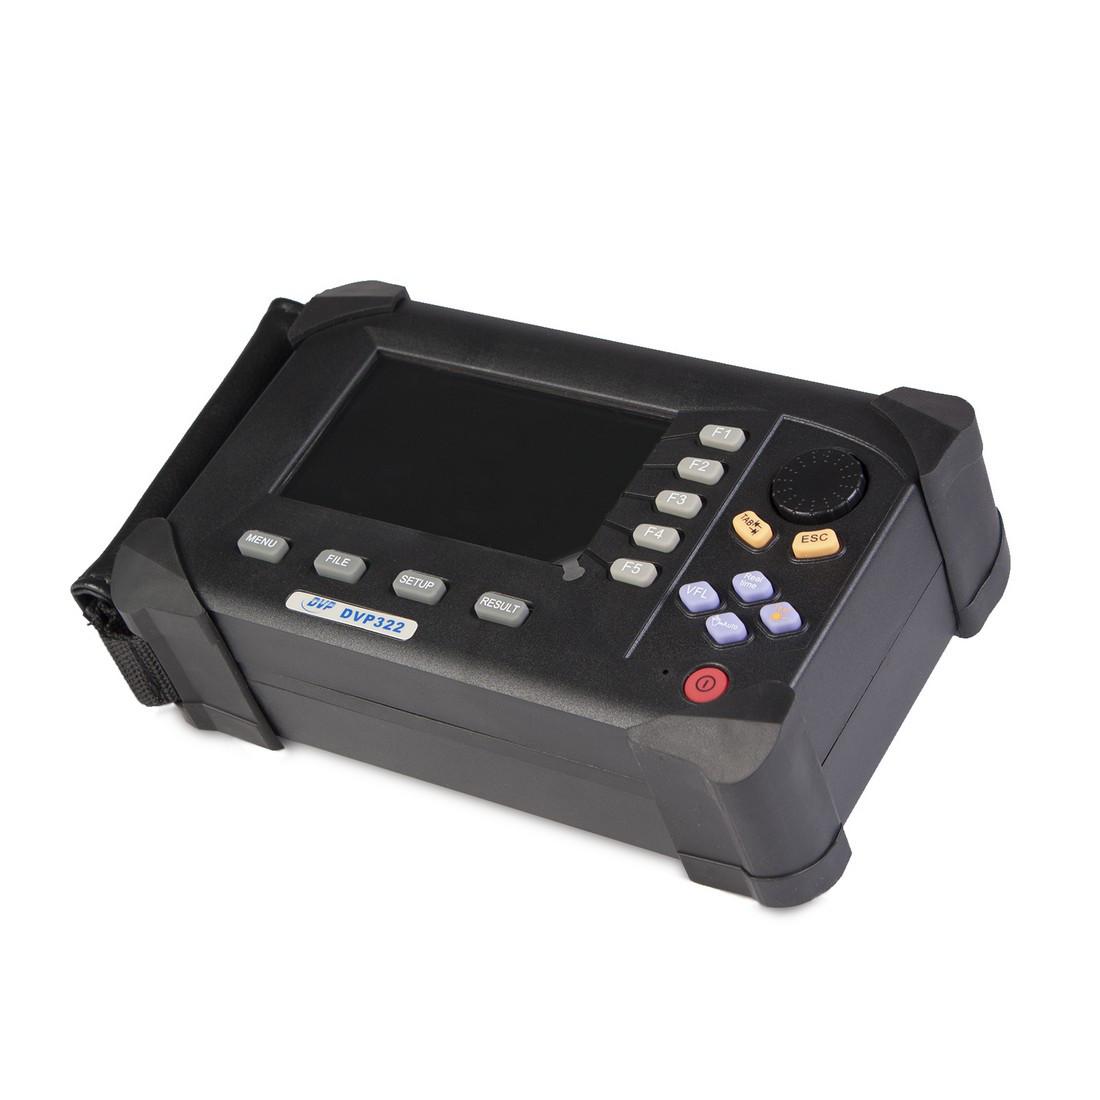 Рефлектометр оптический DVP 322